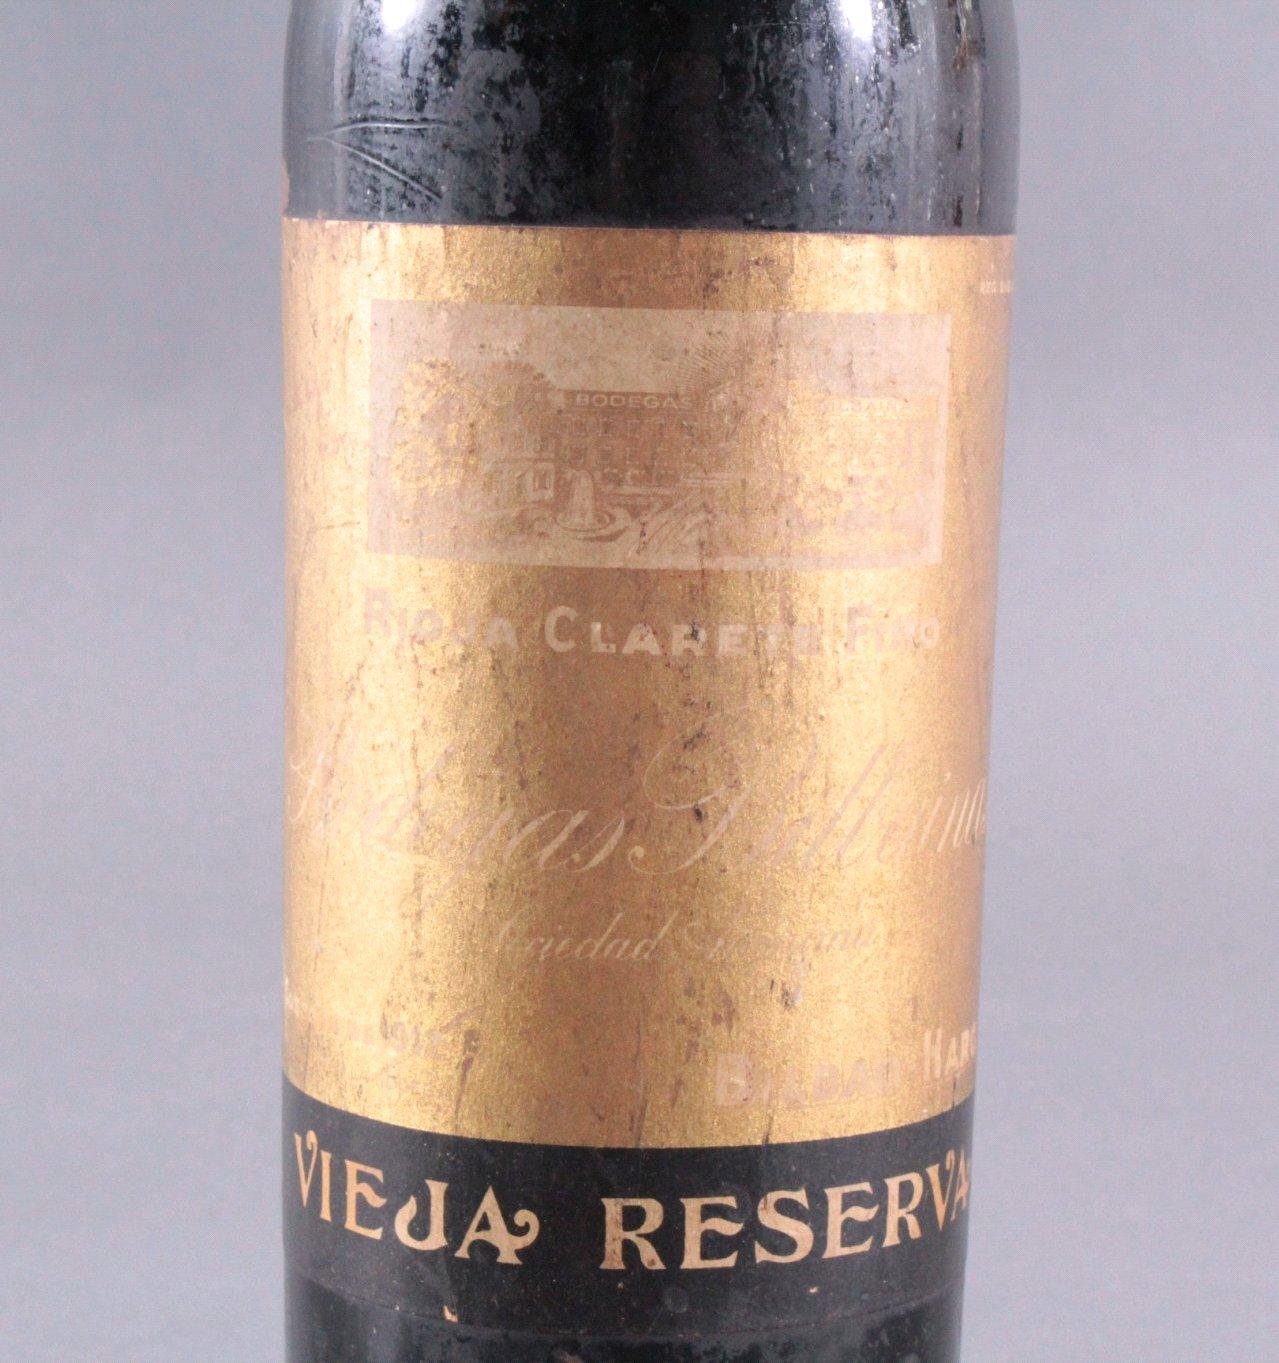 Rotwein, Vieja Reserva, Rioja Clarete Fino 1912-2